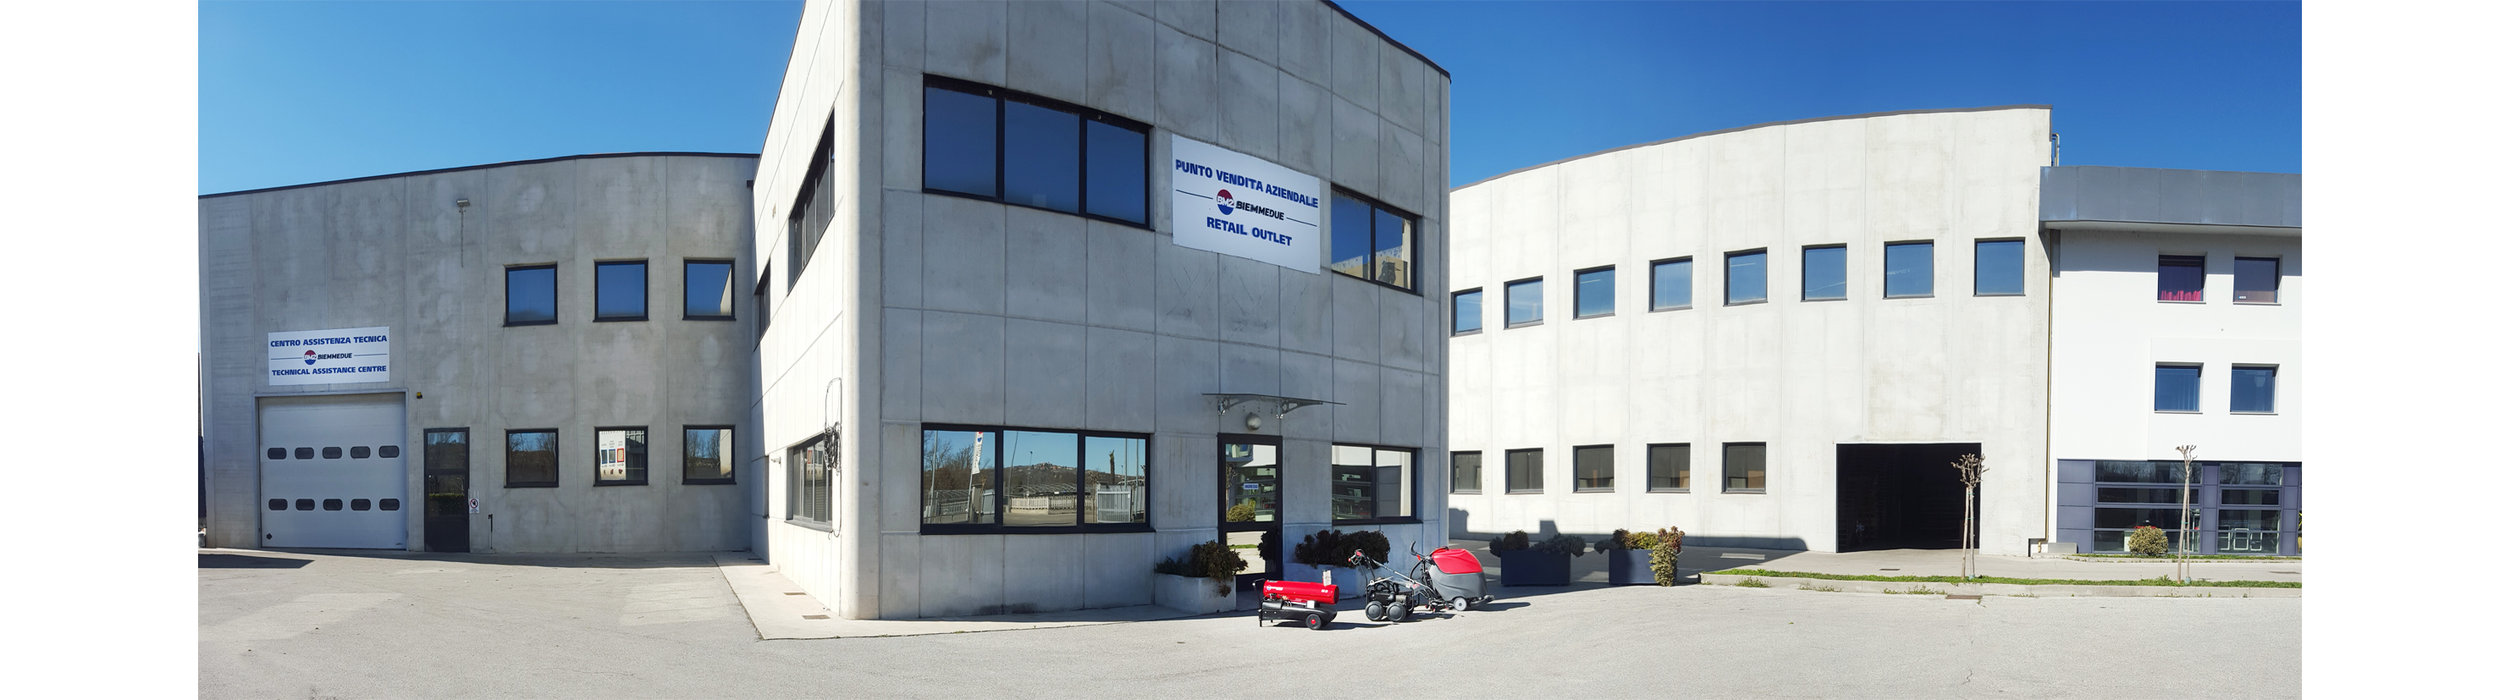 biemmedue leader riscaldamento professionale macchine per pulizia industriale deumidificatori professionali